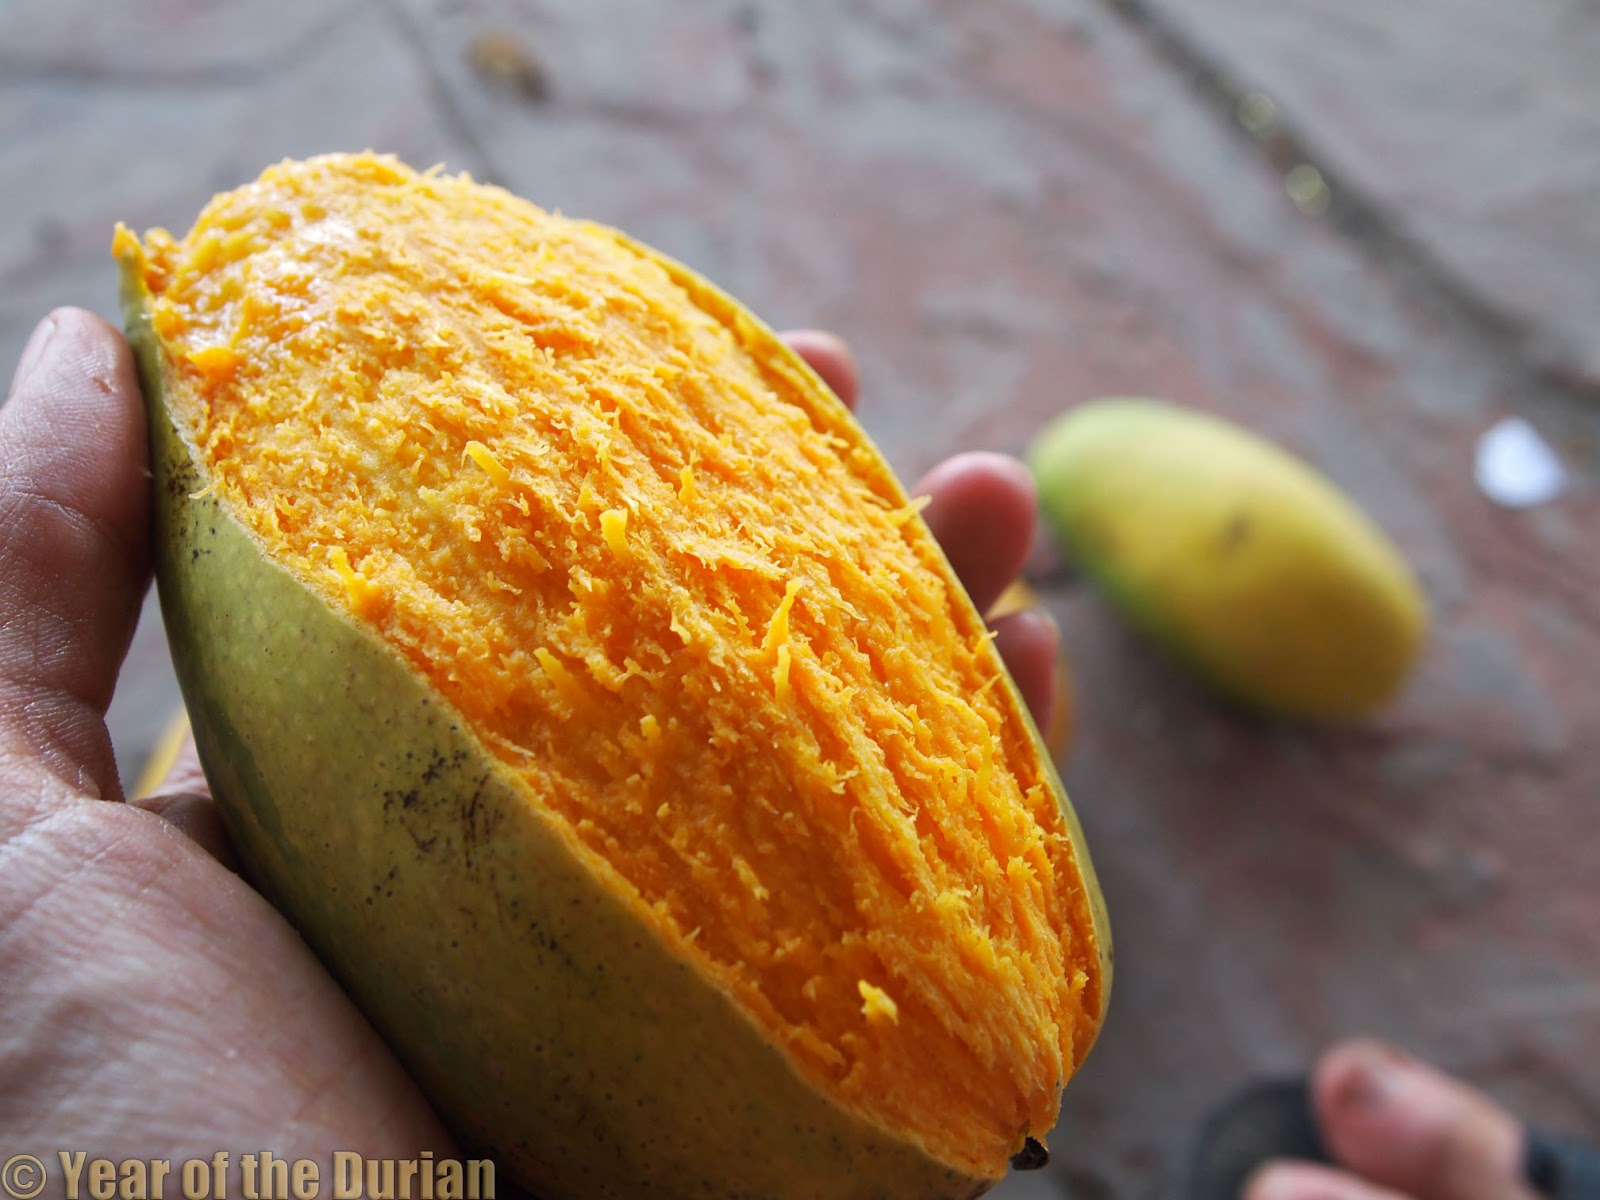 essay of mango tree Mango (mangifera indica) is the national fruit of india this essay provides interesting information and facts on mango, the king of fruits.